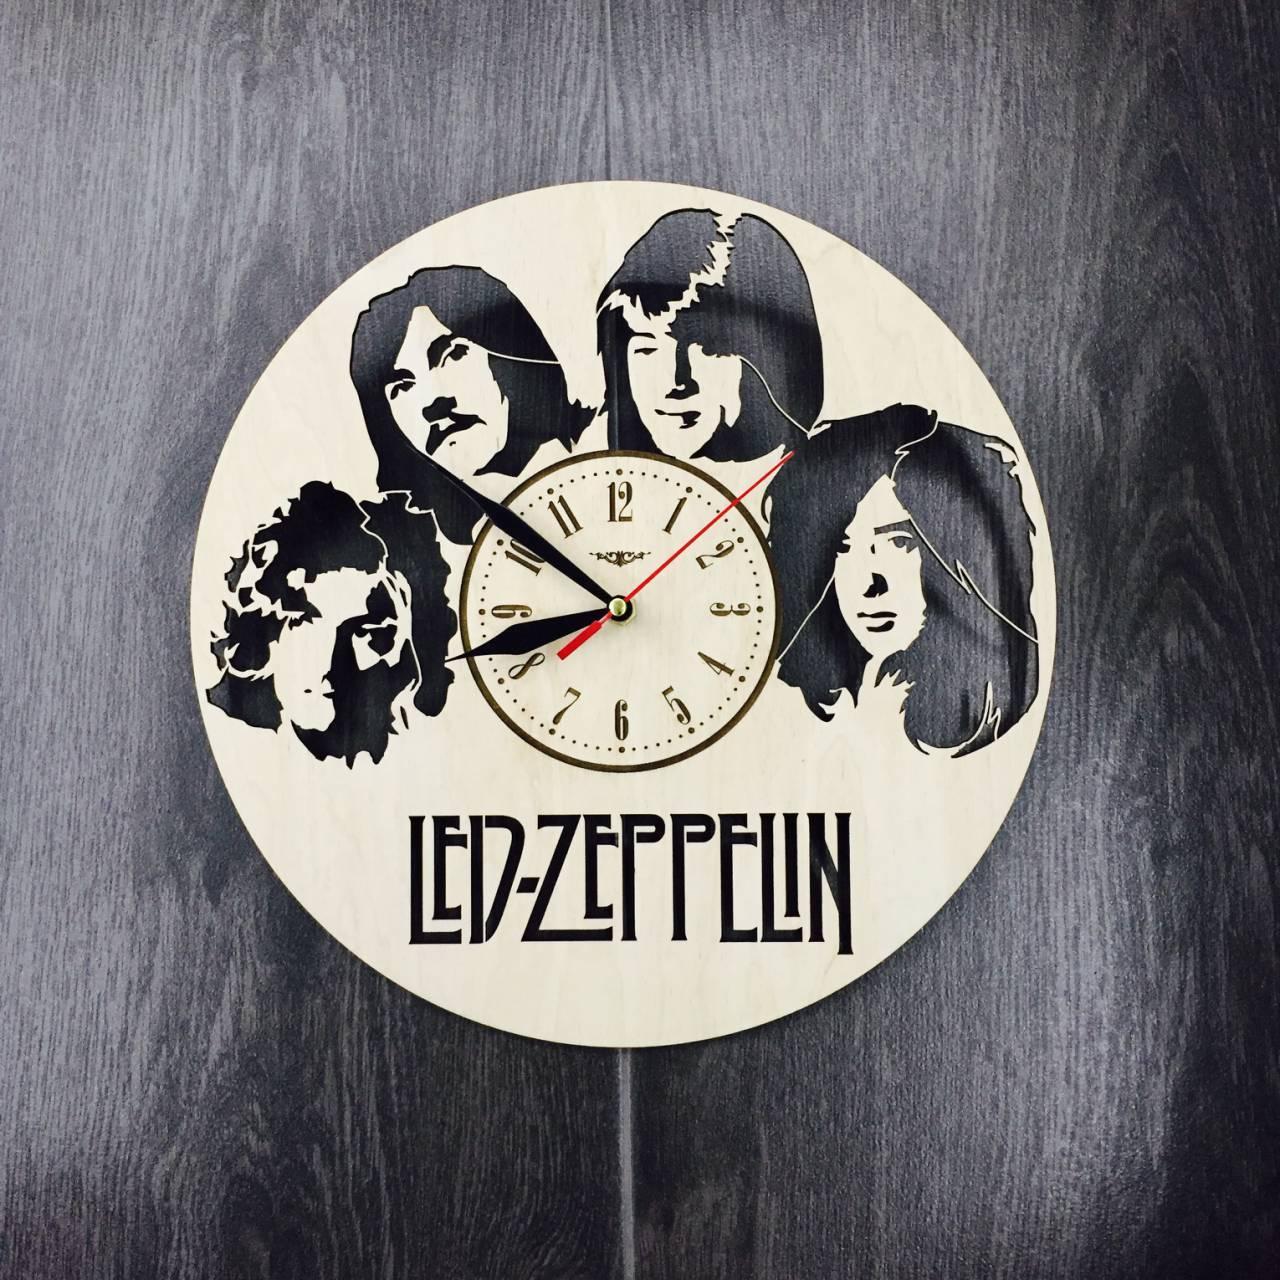 Арт-часы настенные деревянные круглые «Led Zeppelin»